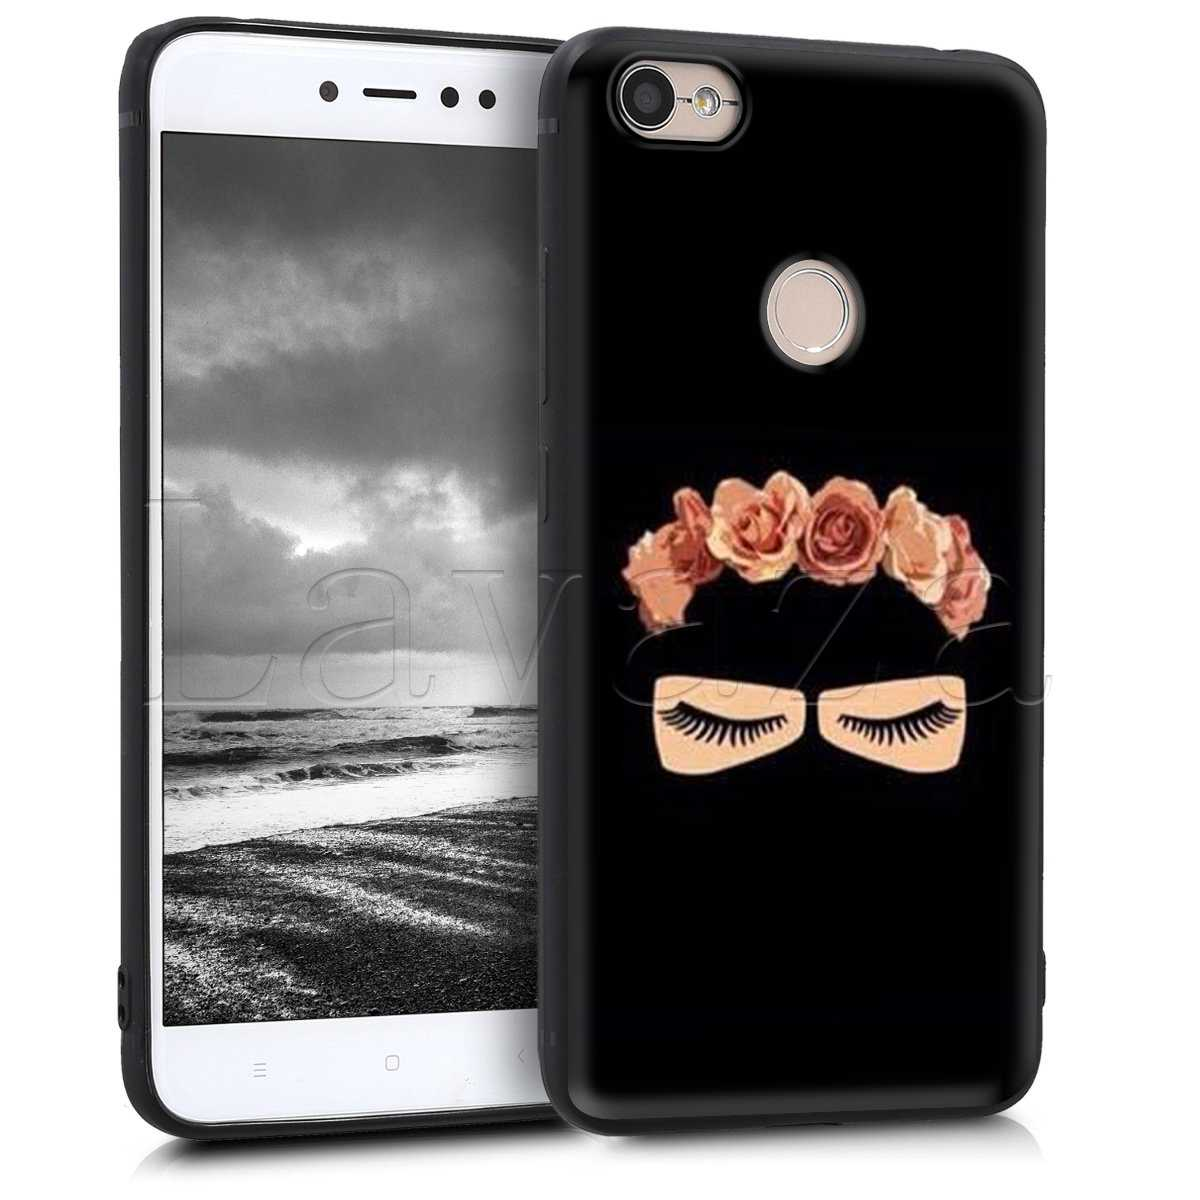 Lavaza Islâmico Muçulmano Gril Olhos Caso para Xiaomi Redmi Nota 4 4X 4A 5 5A 6 6a 7 Pro Go prime Plus